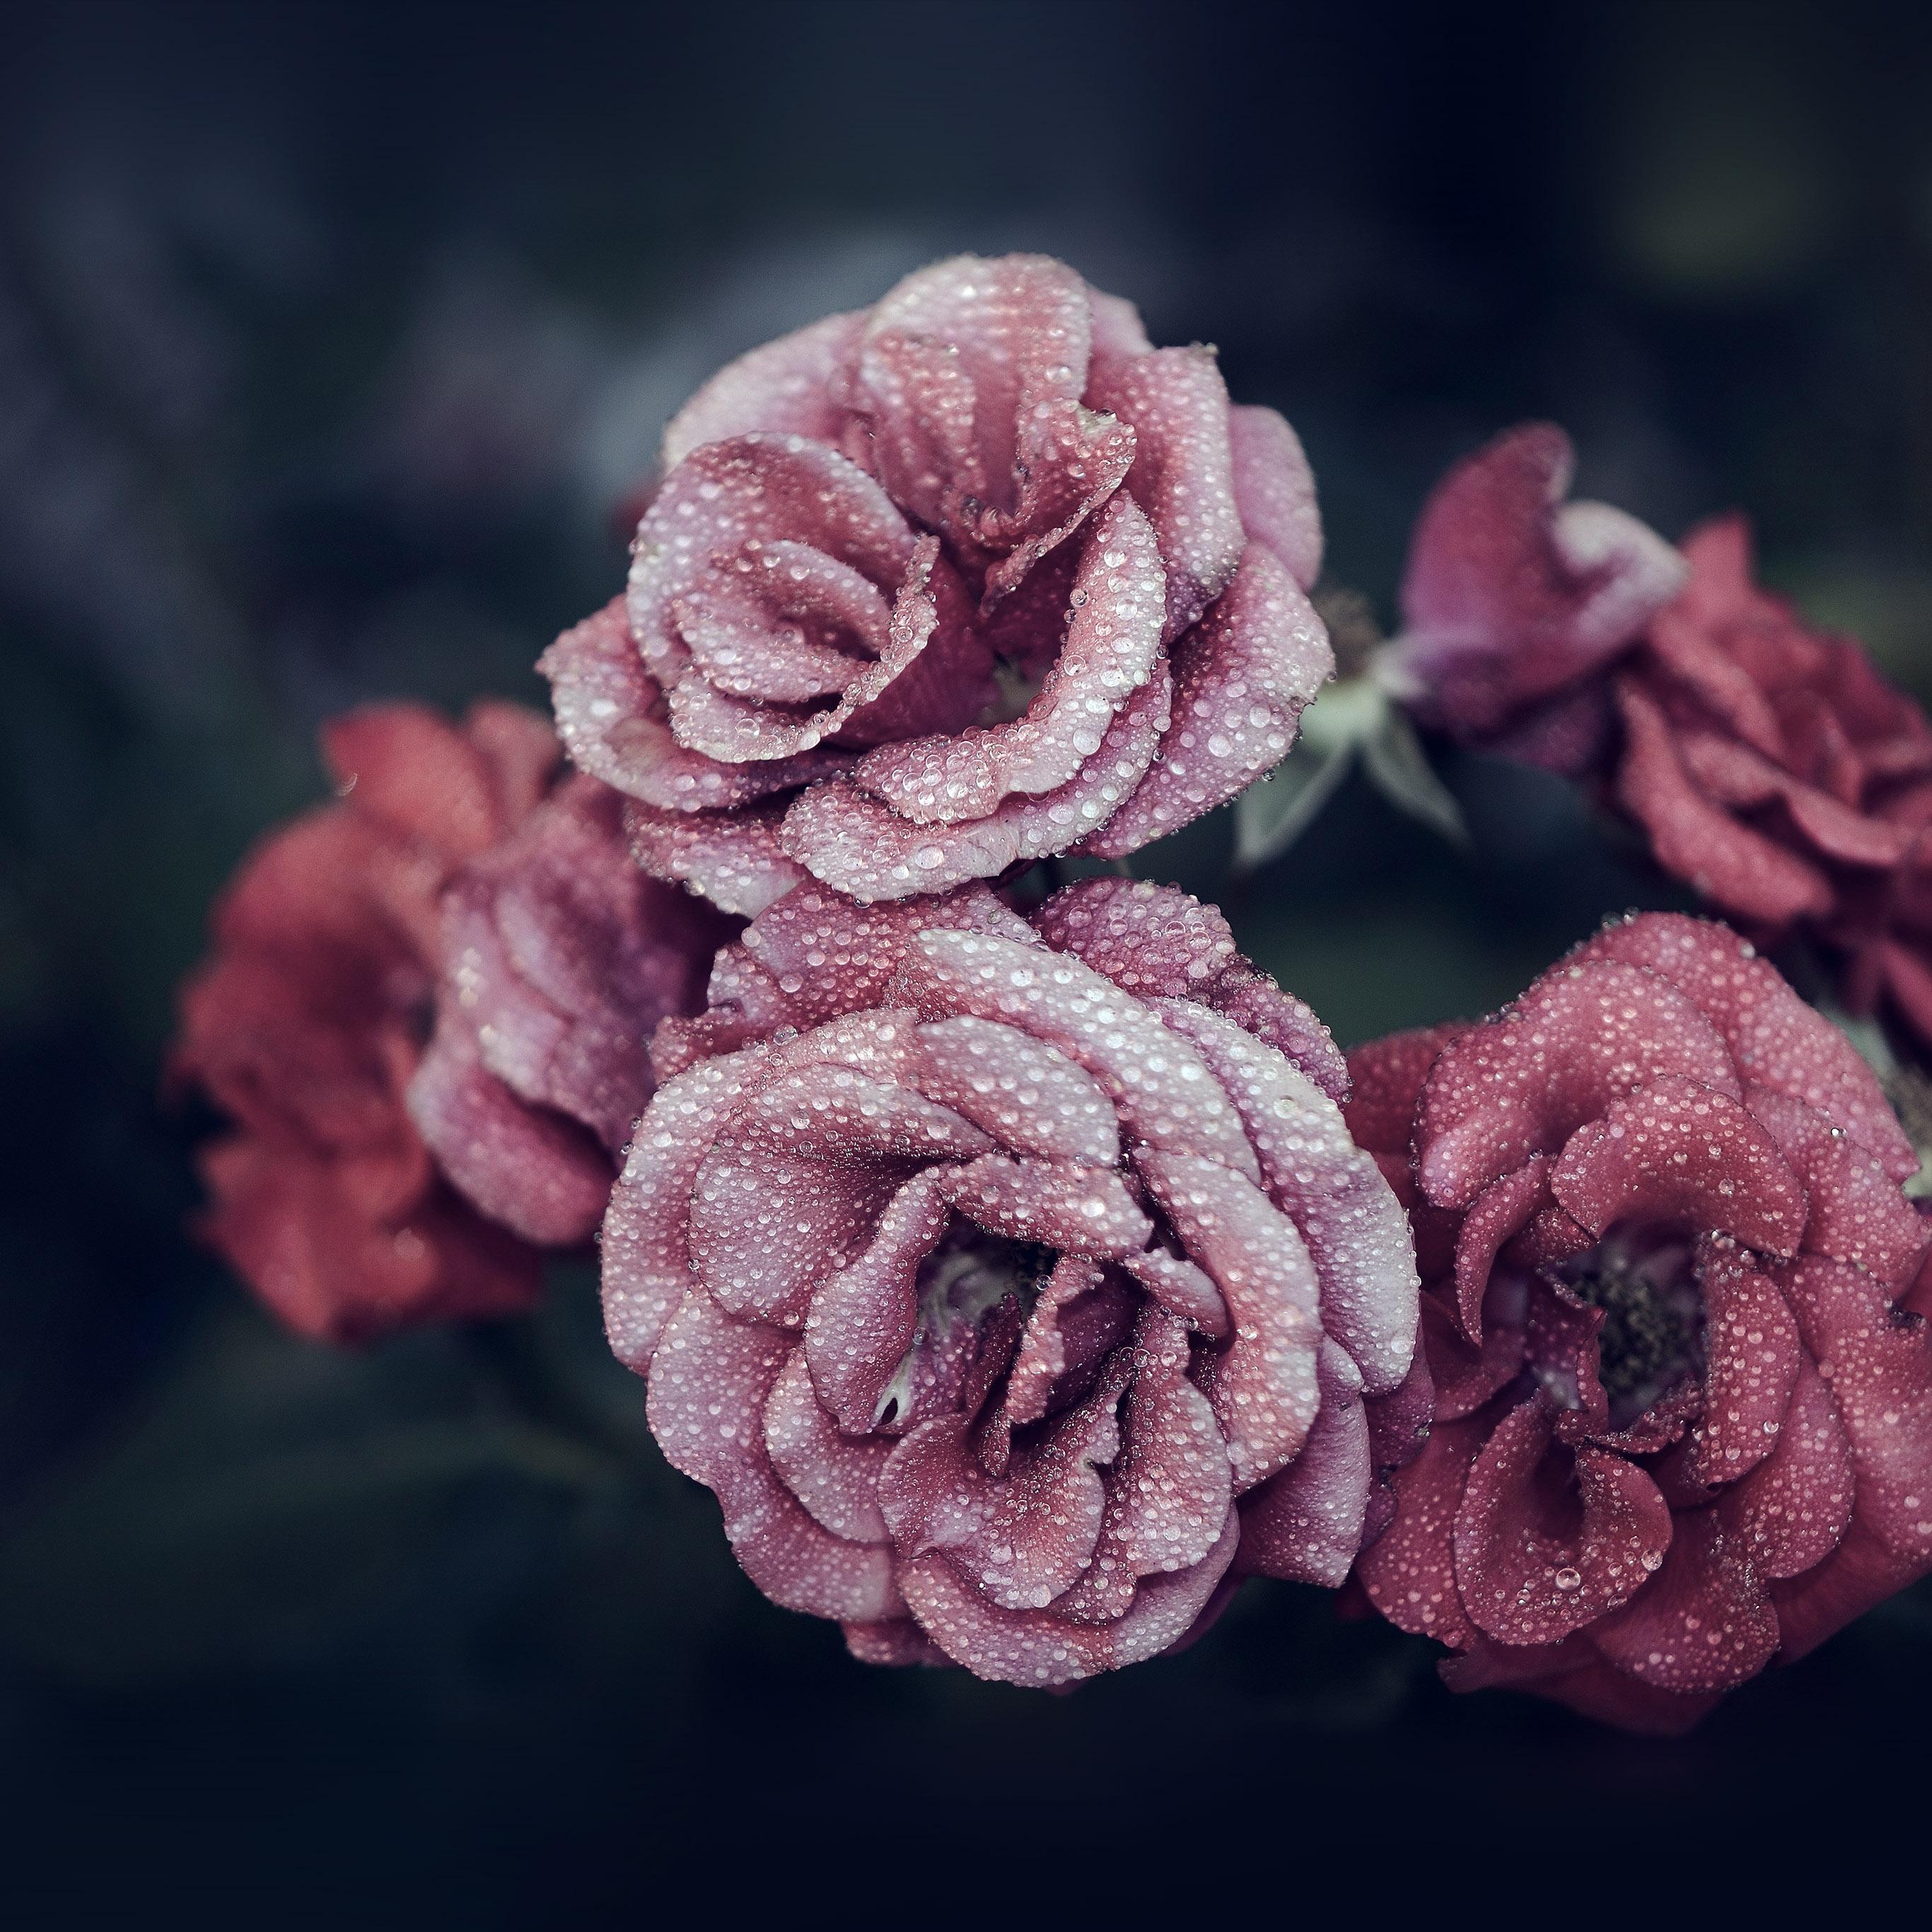 Nf66 Rose Pink Raindrop Flower Summer Nature Blue Wallpaper